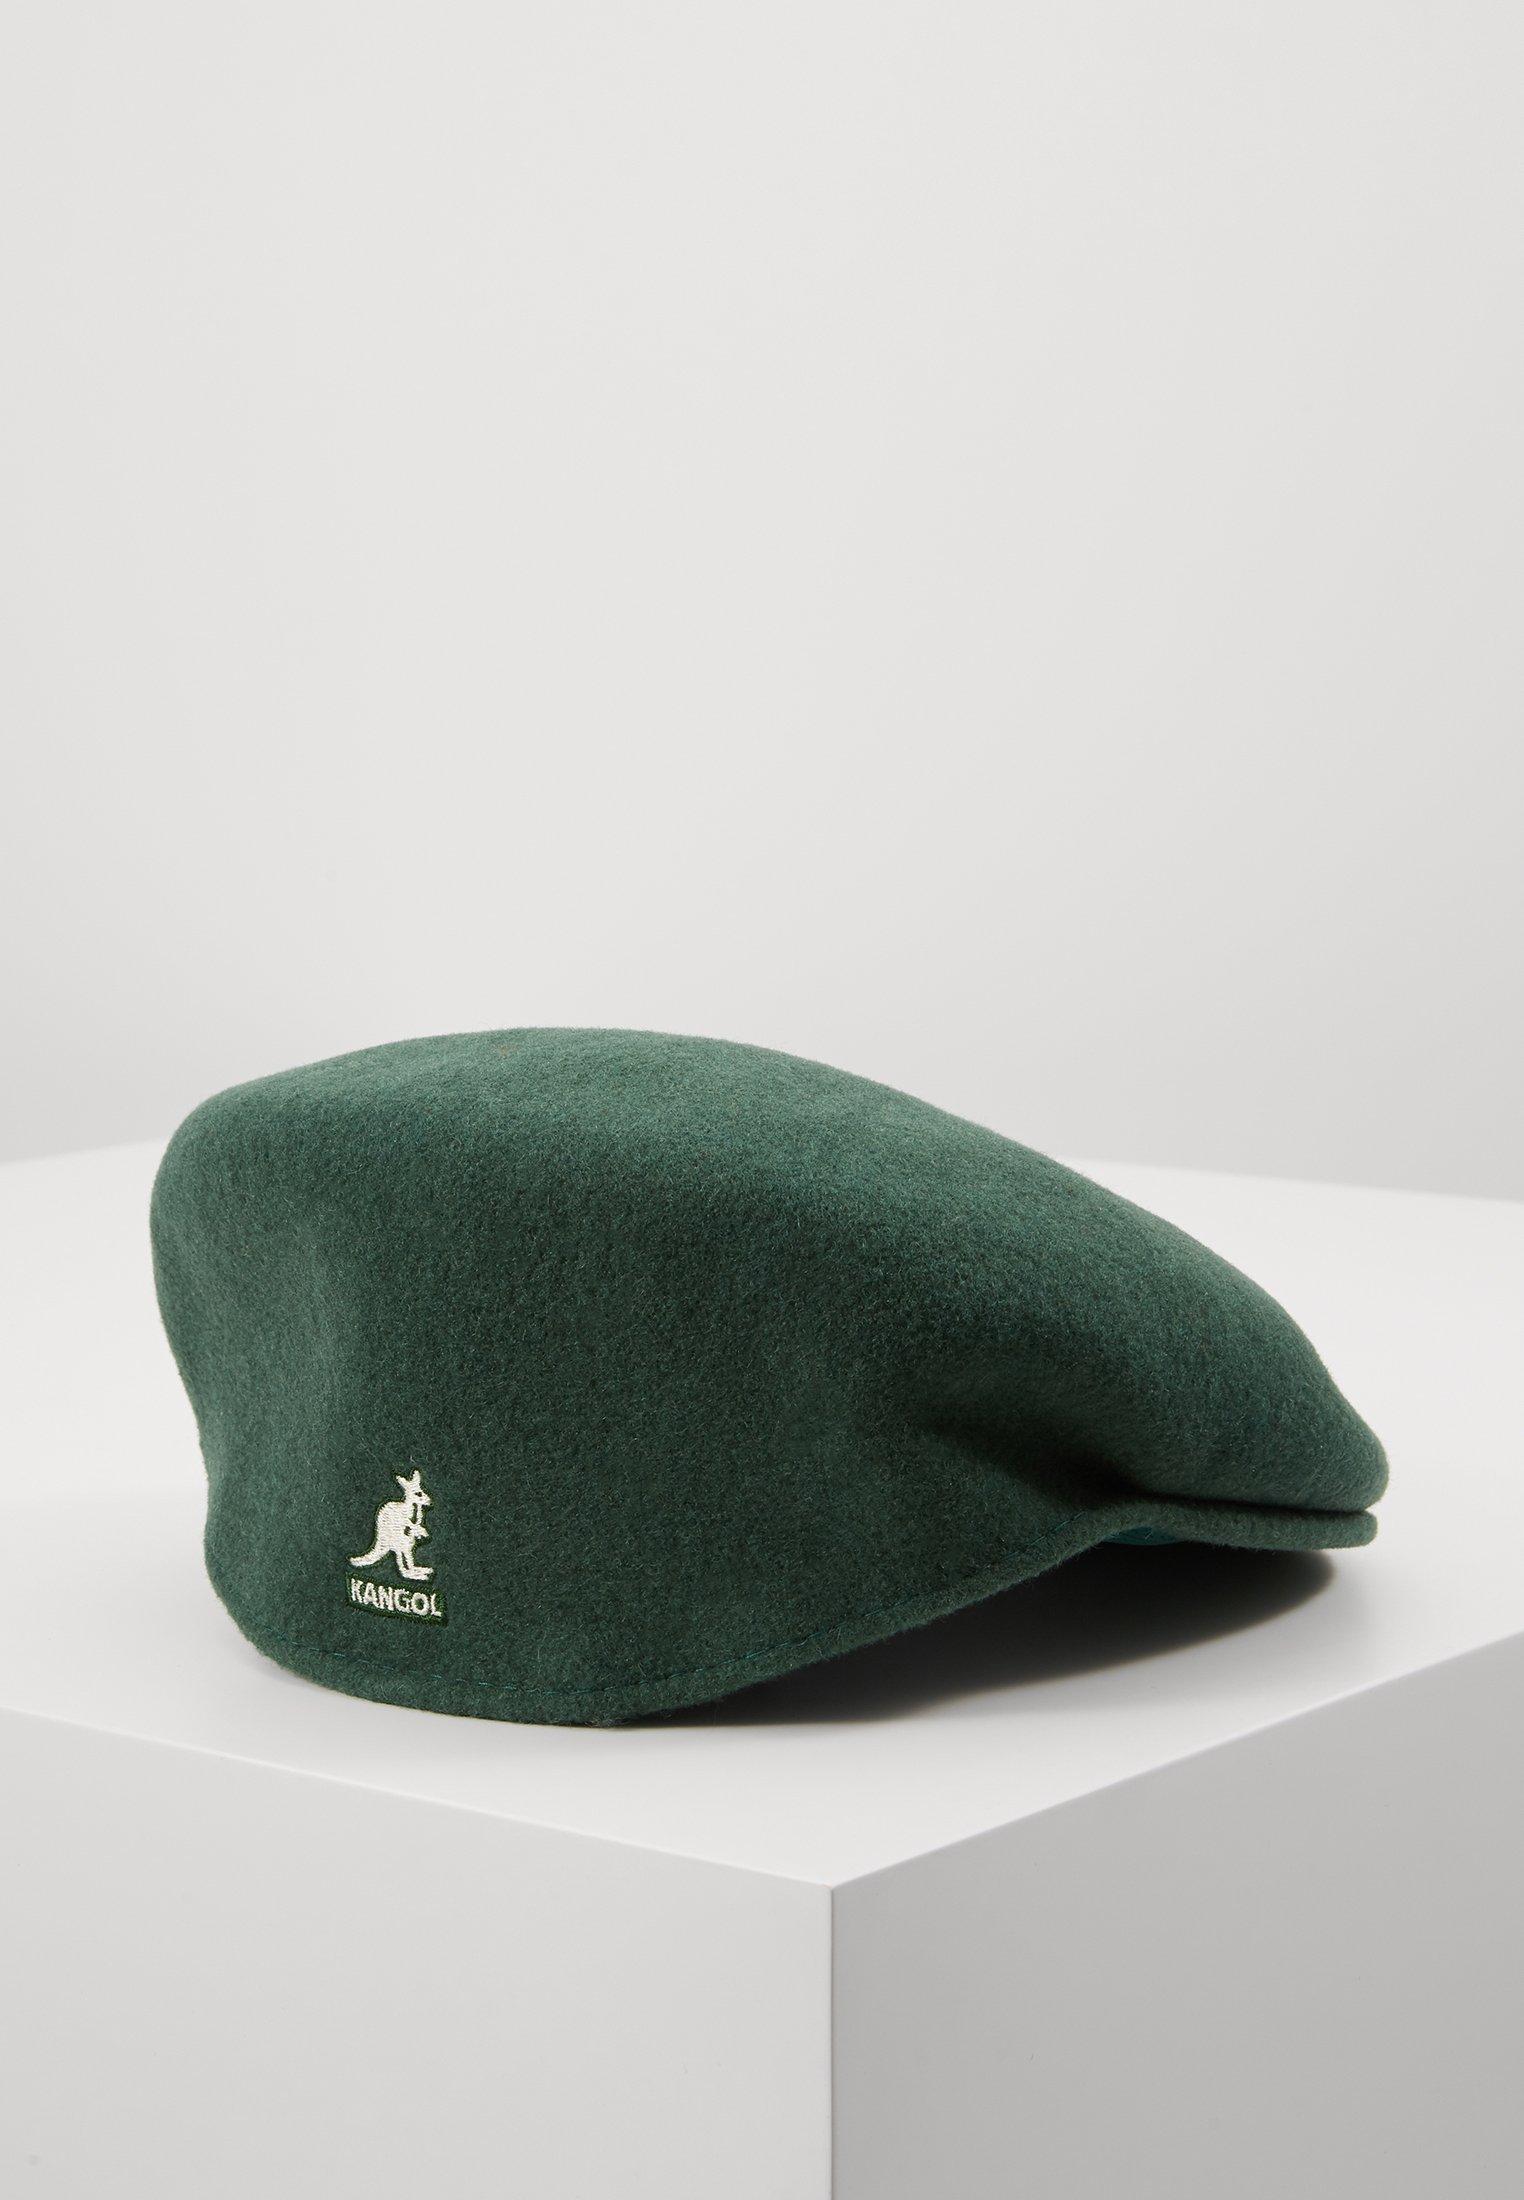 Kangol BonnetDark BonnetDark BonnetDark Kangol BonnetDark Green Green Kangol Green Kangol vm0wNO8yn